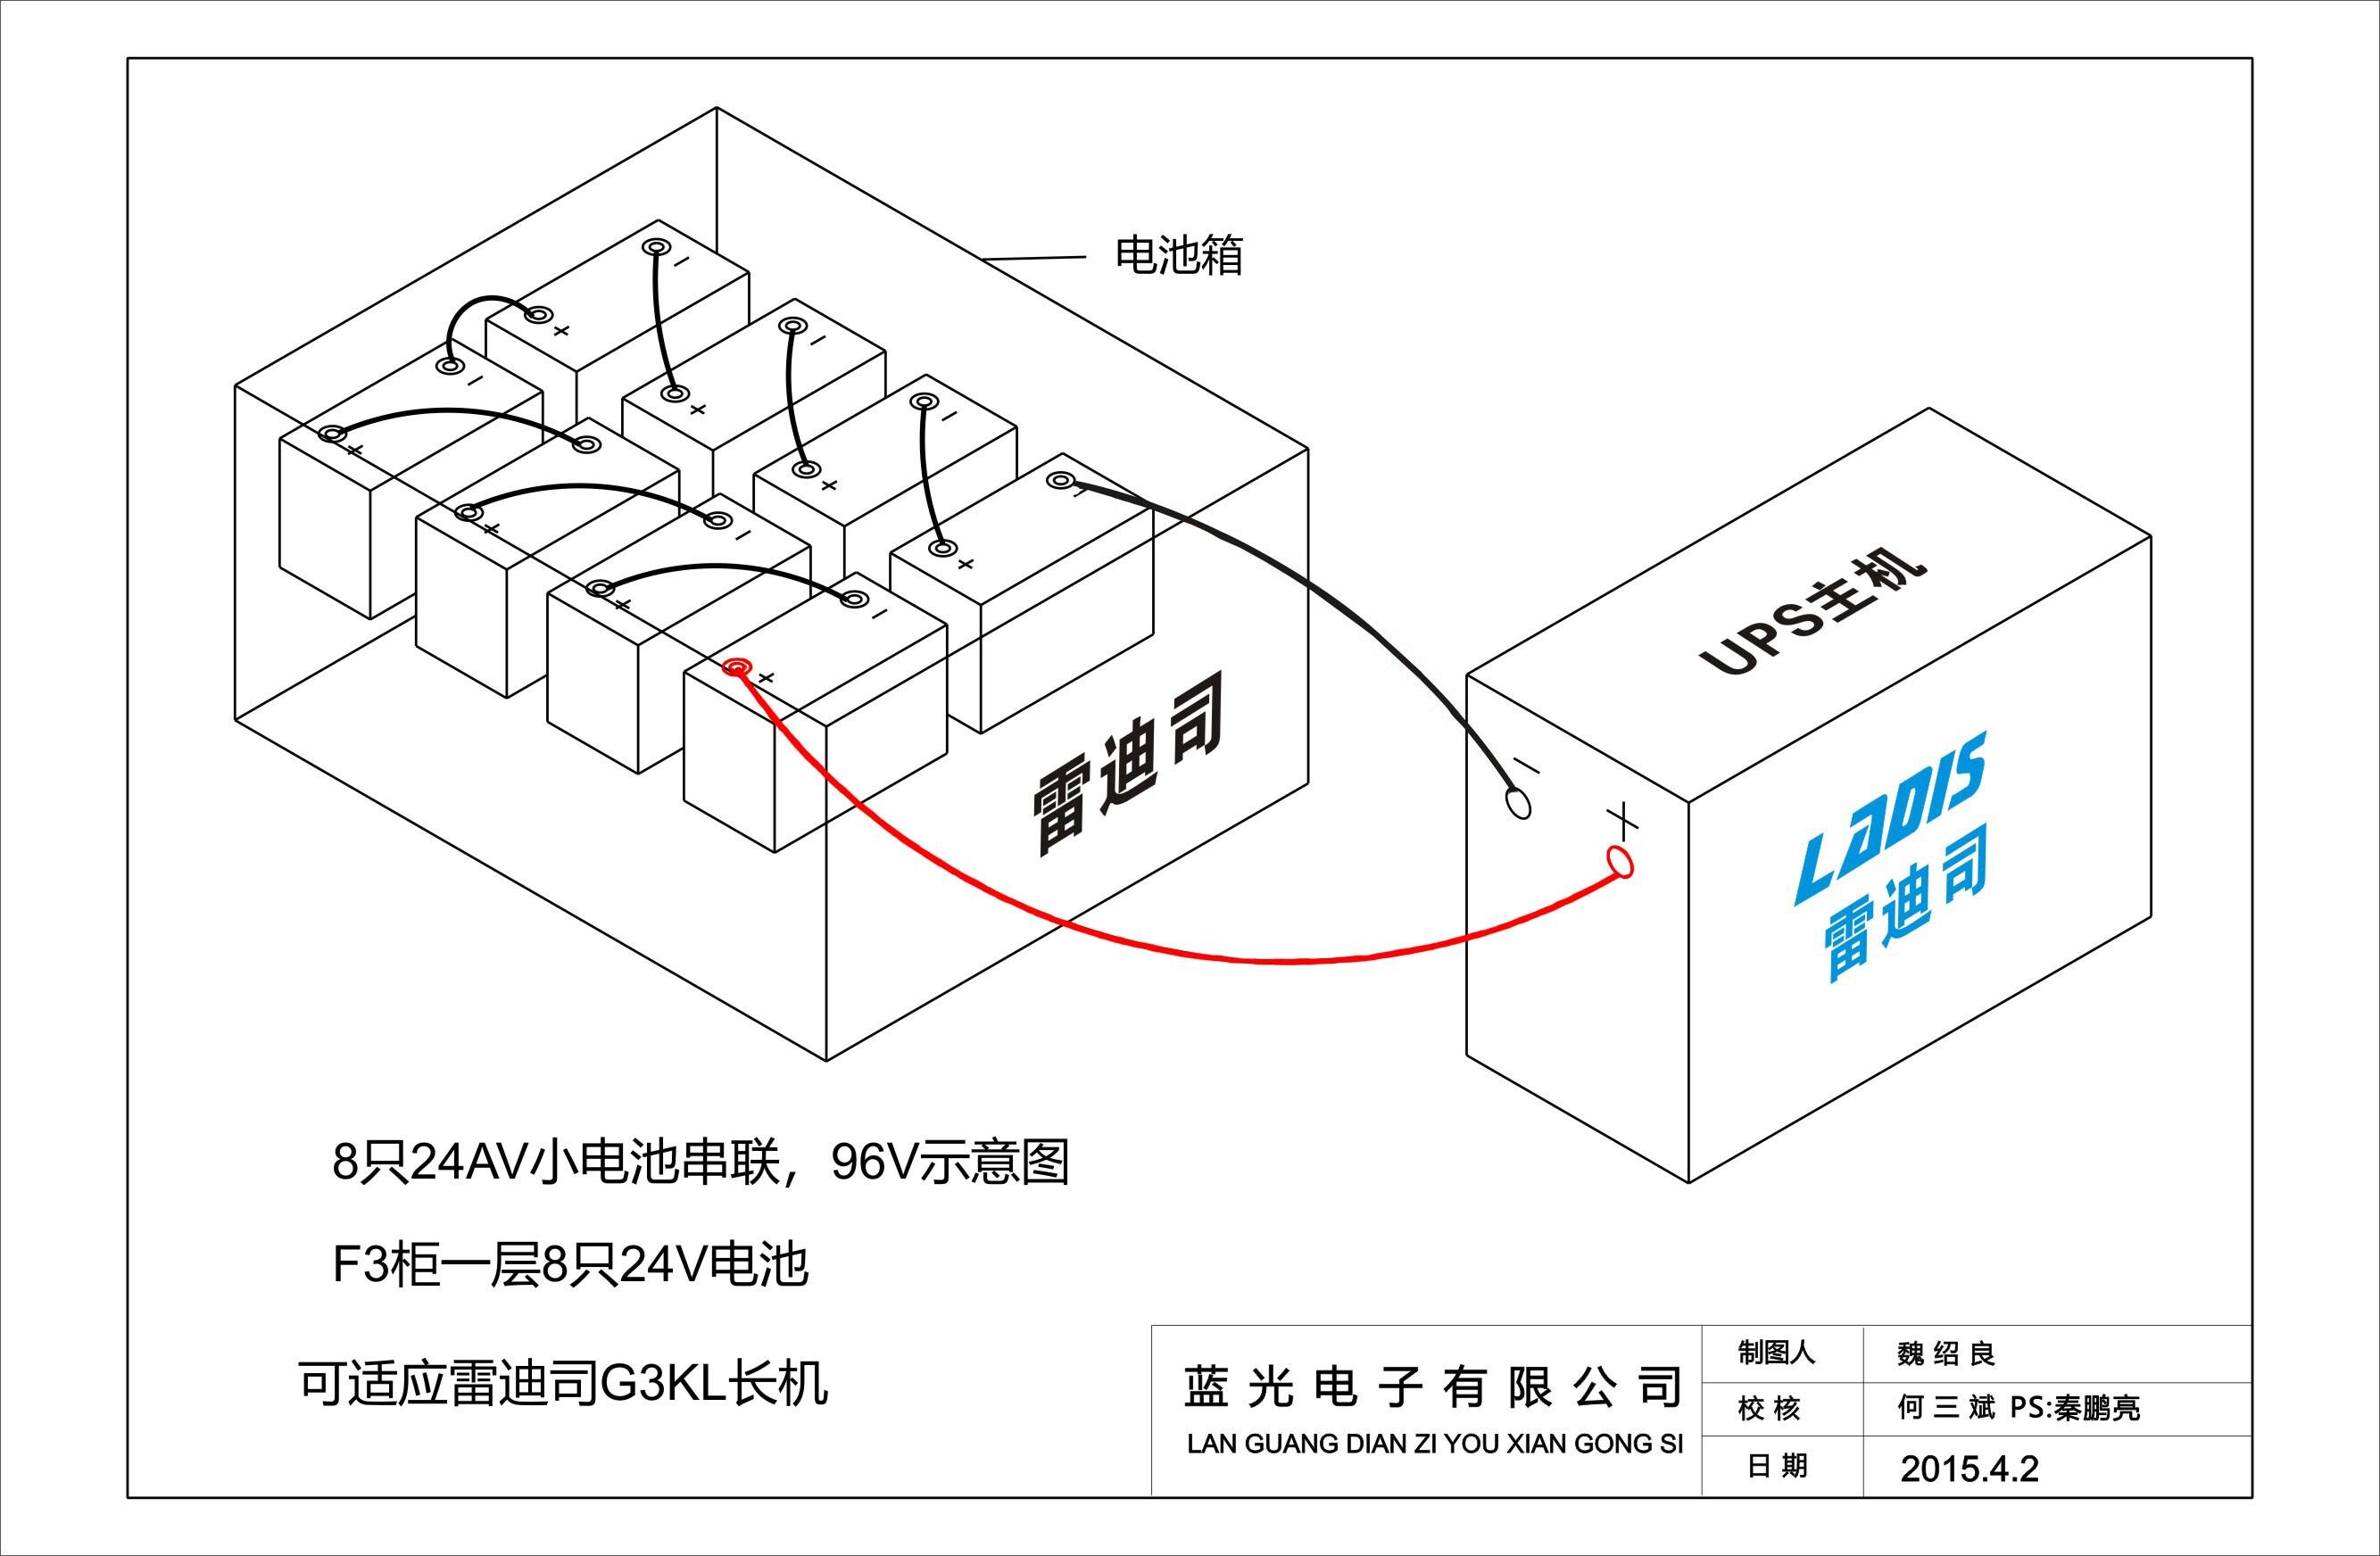 g3kl主机8只电池接线图(小电池)